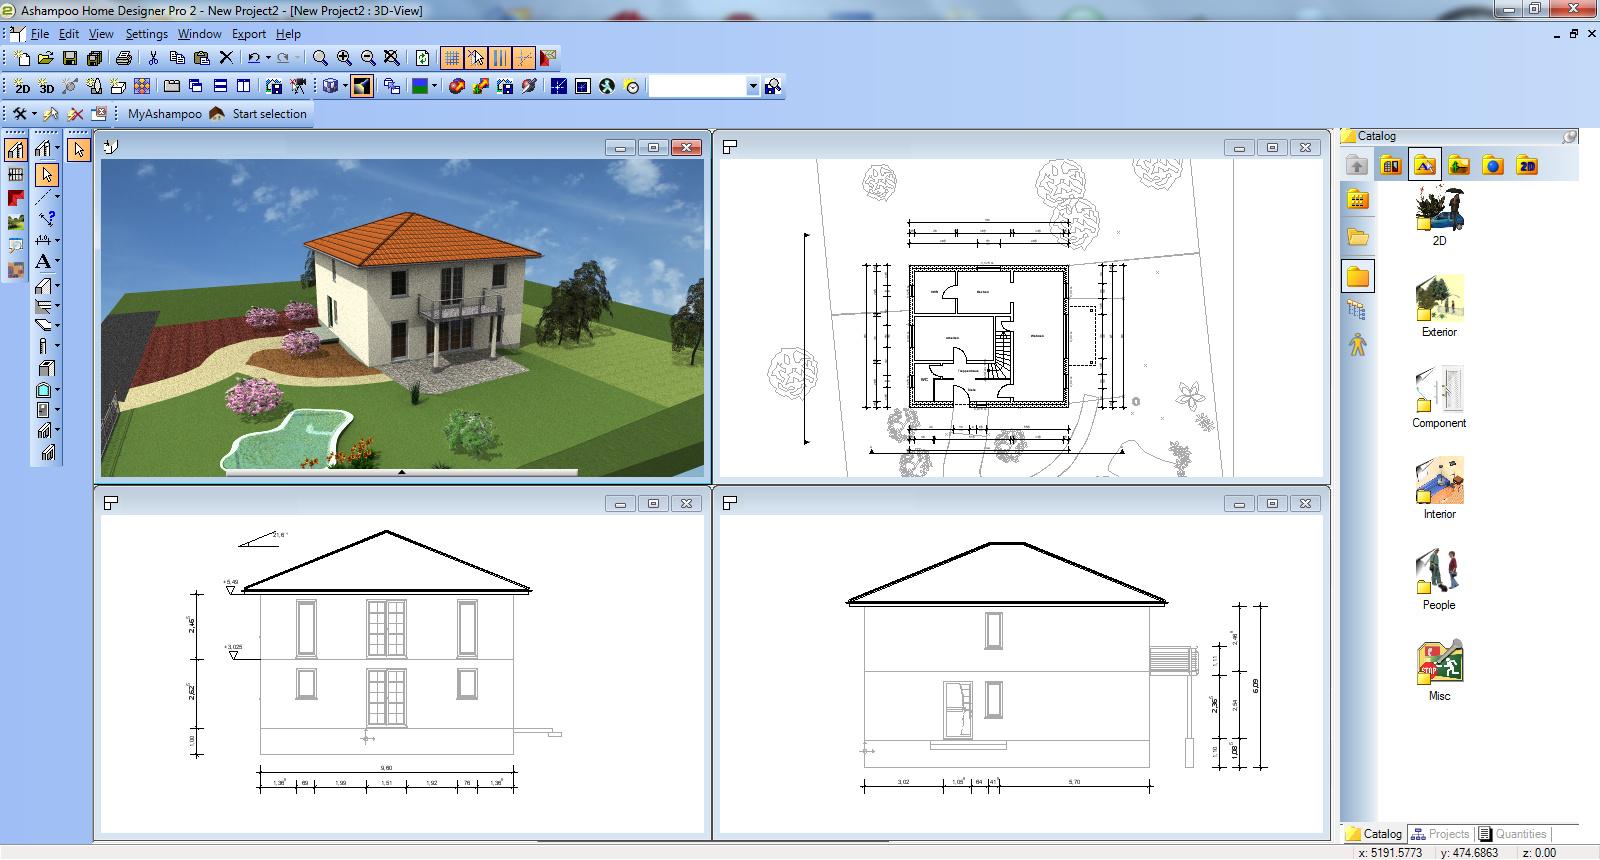 Home Designer Pro 22.3.0.55 Crack With Keygen [Win + Mac]